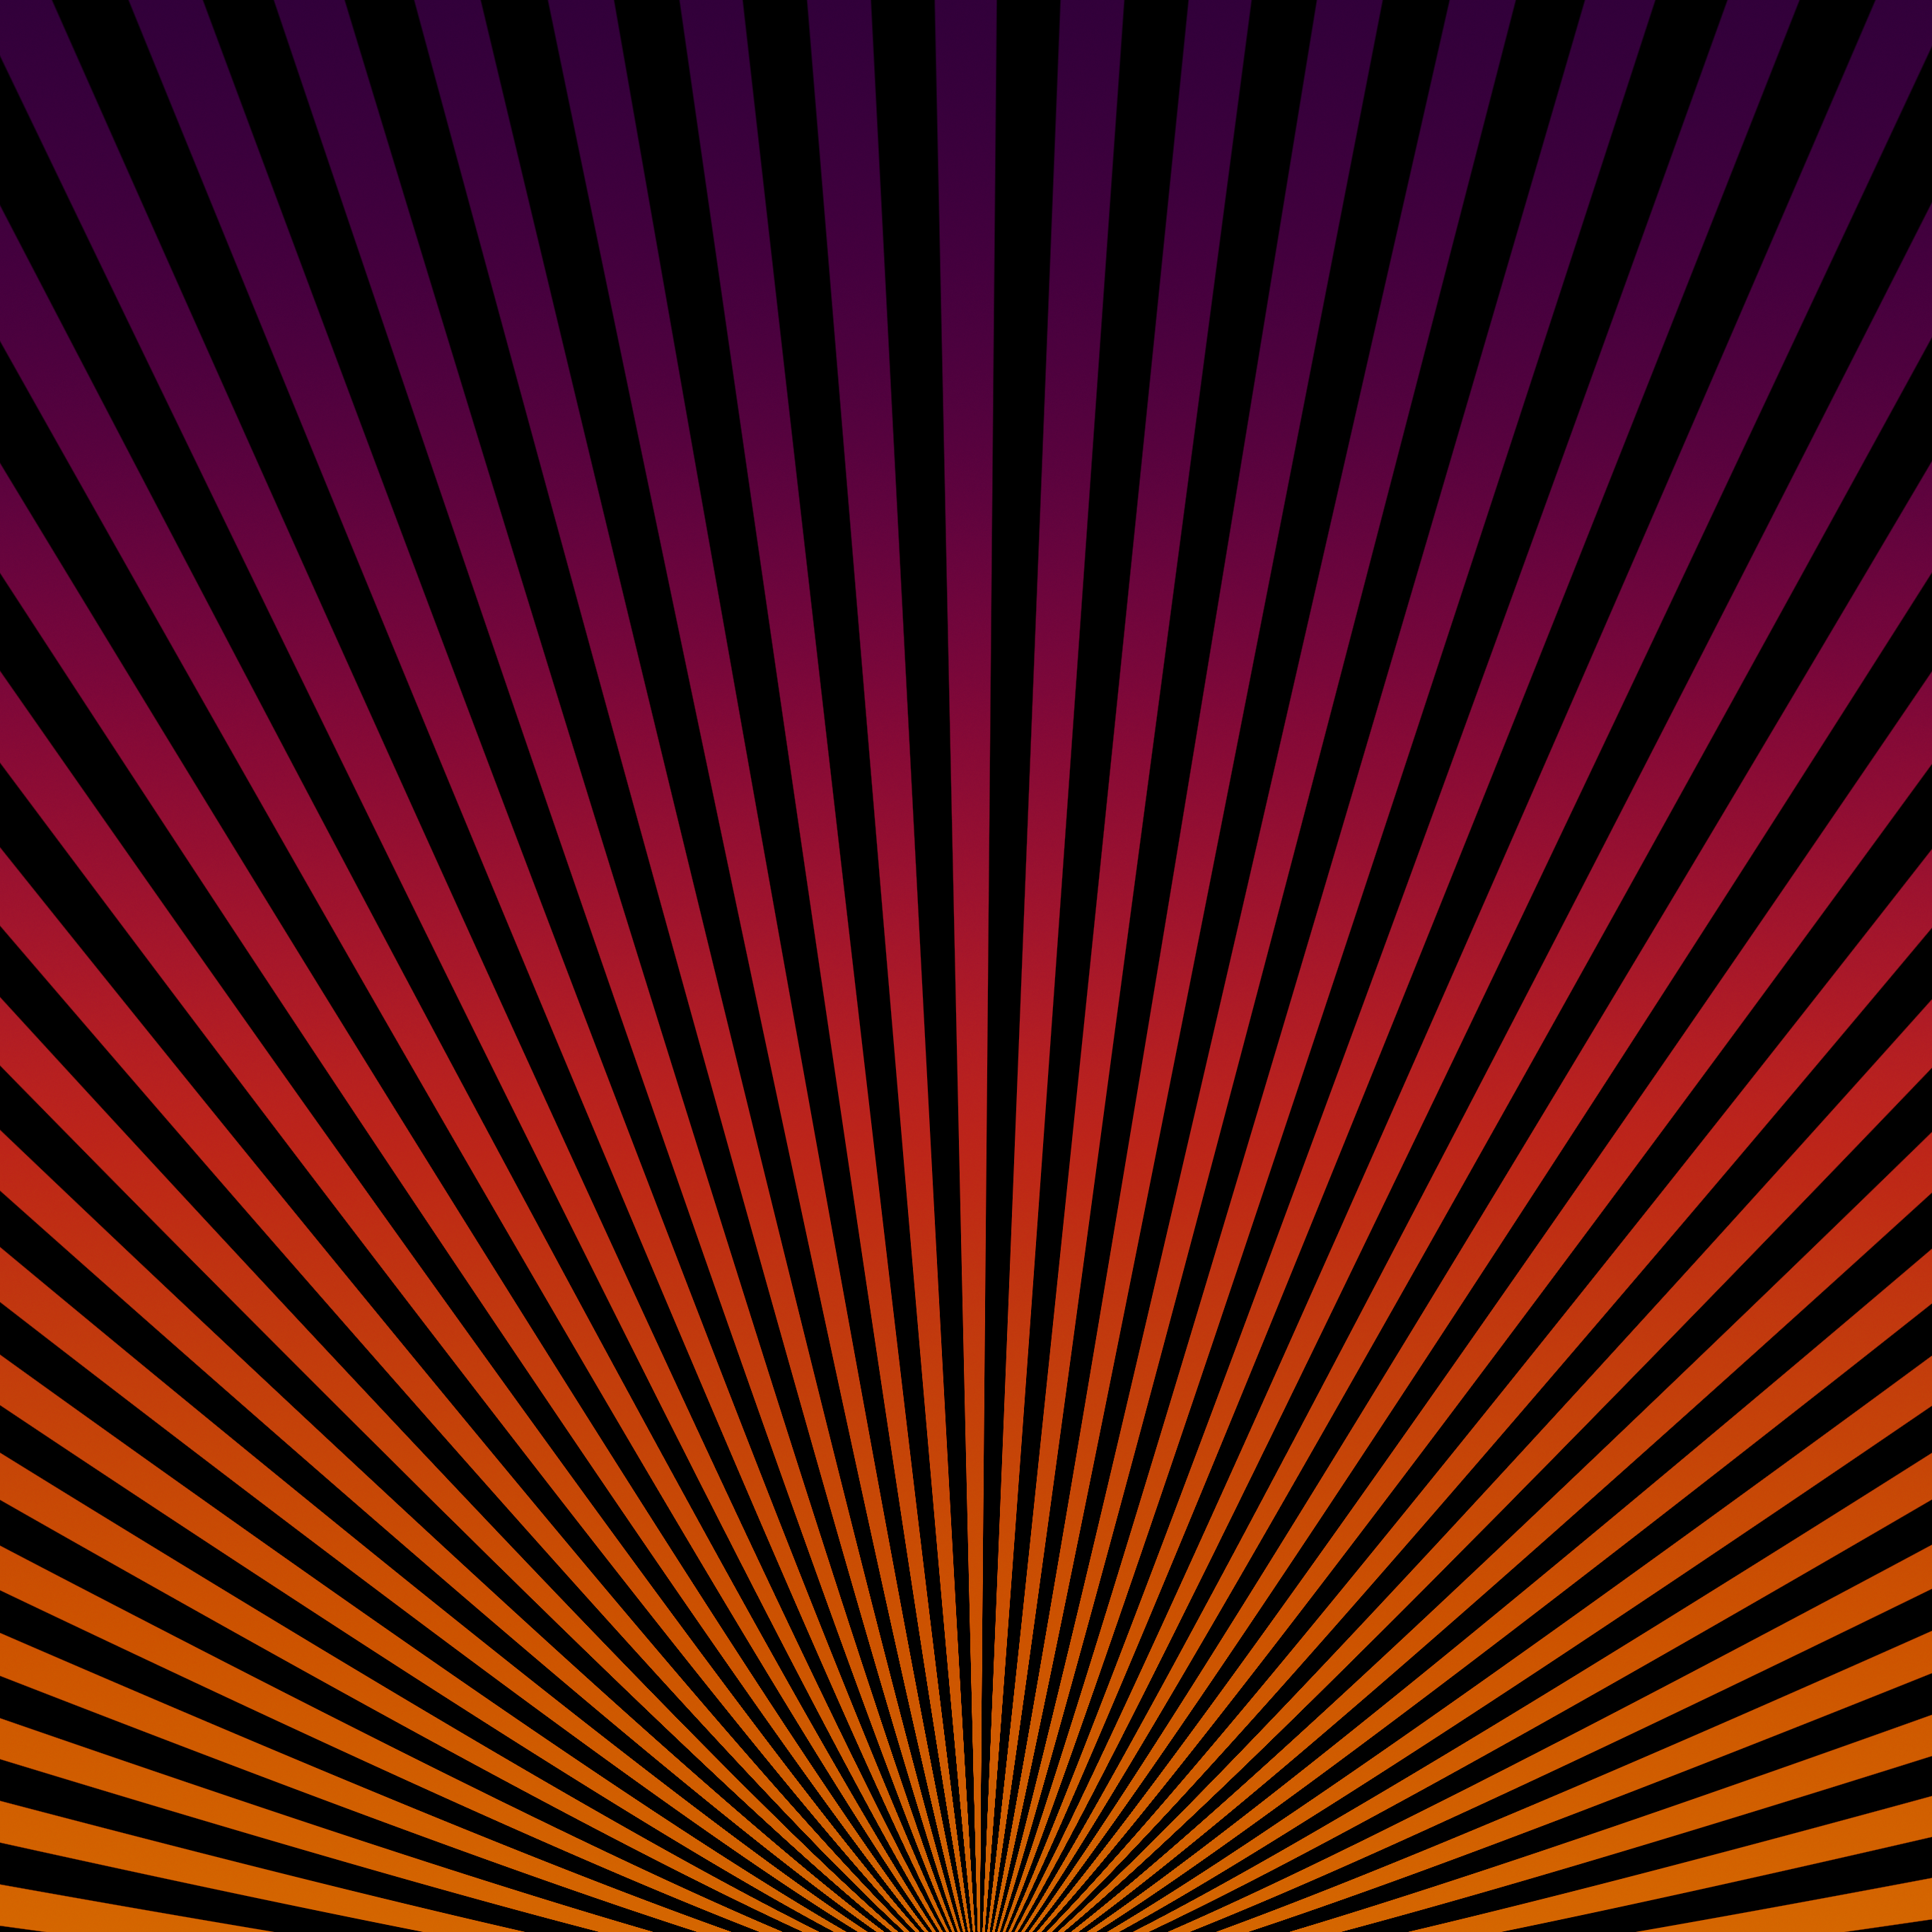 Full screen rays Apple Tower Theatre wallpaper basicappleguy idownloadblog iPad purple